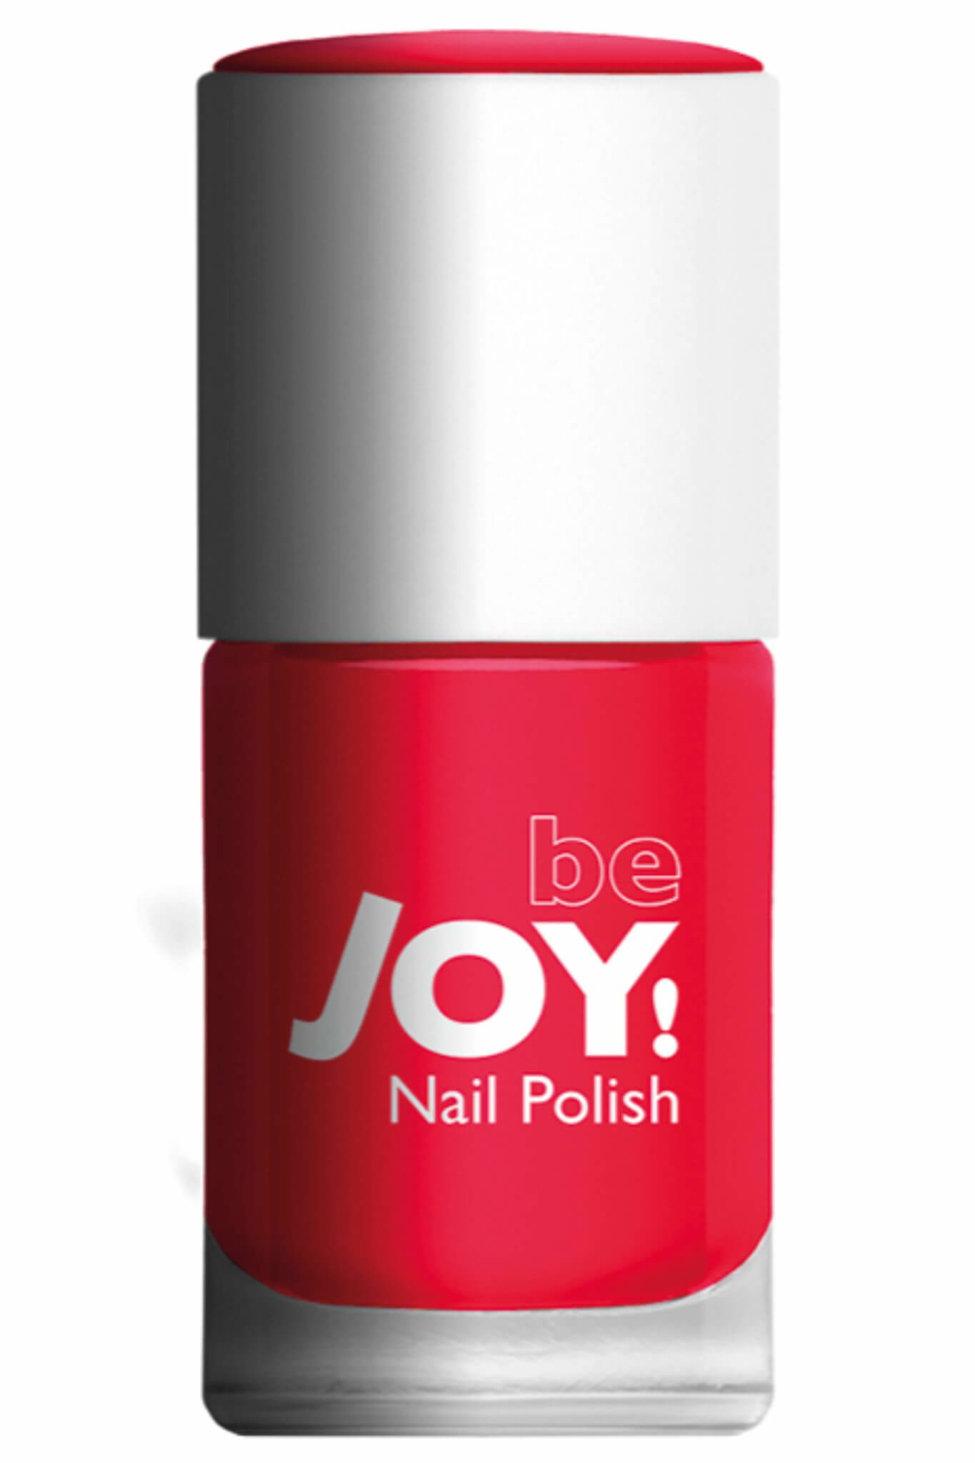 Be joy nail polish κοραλί